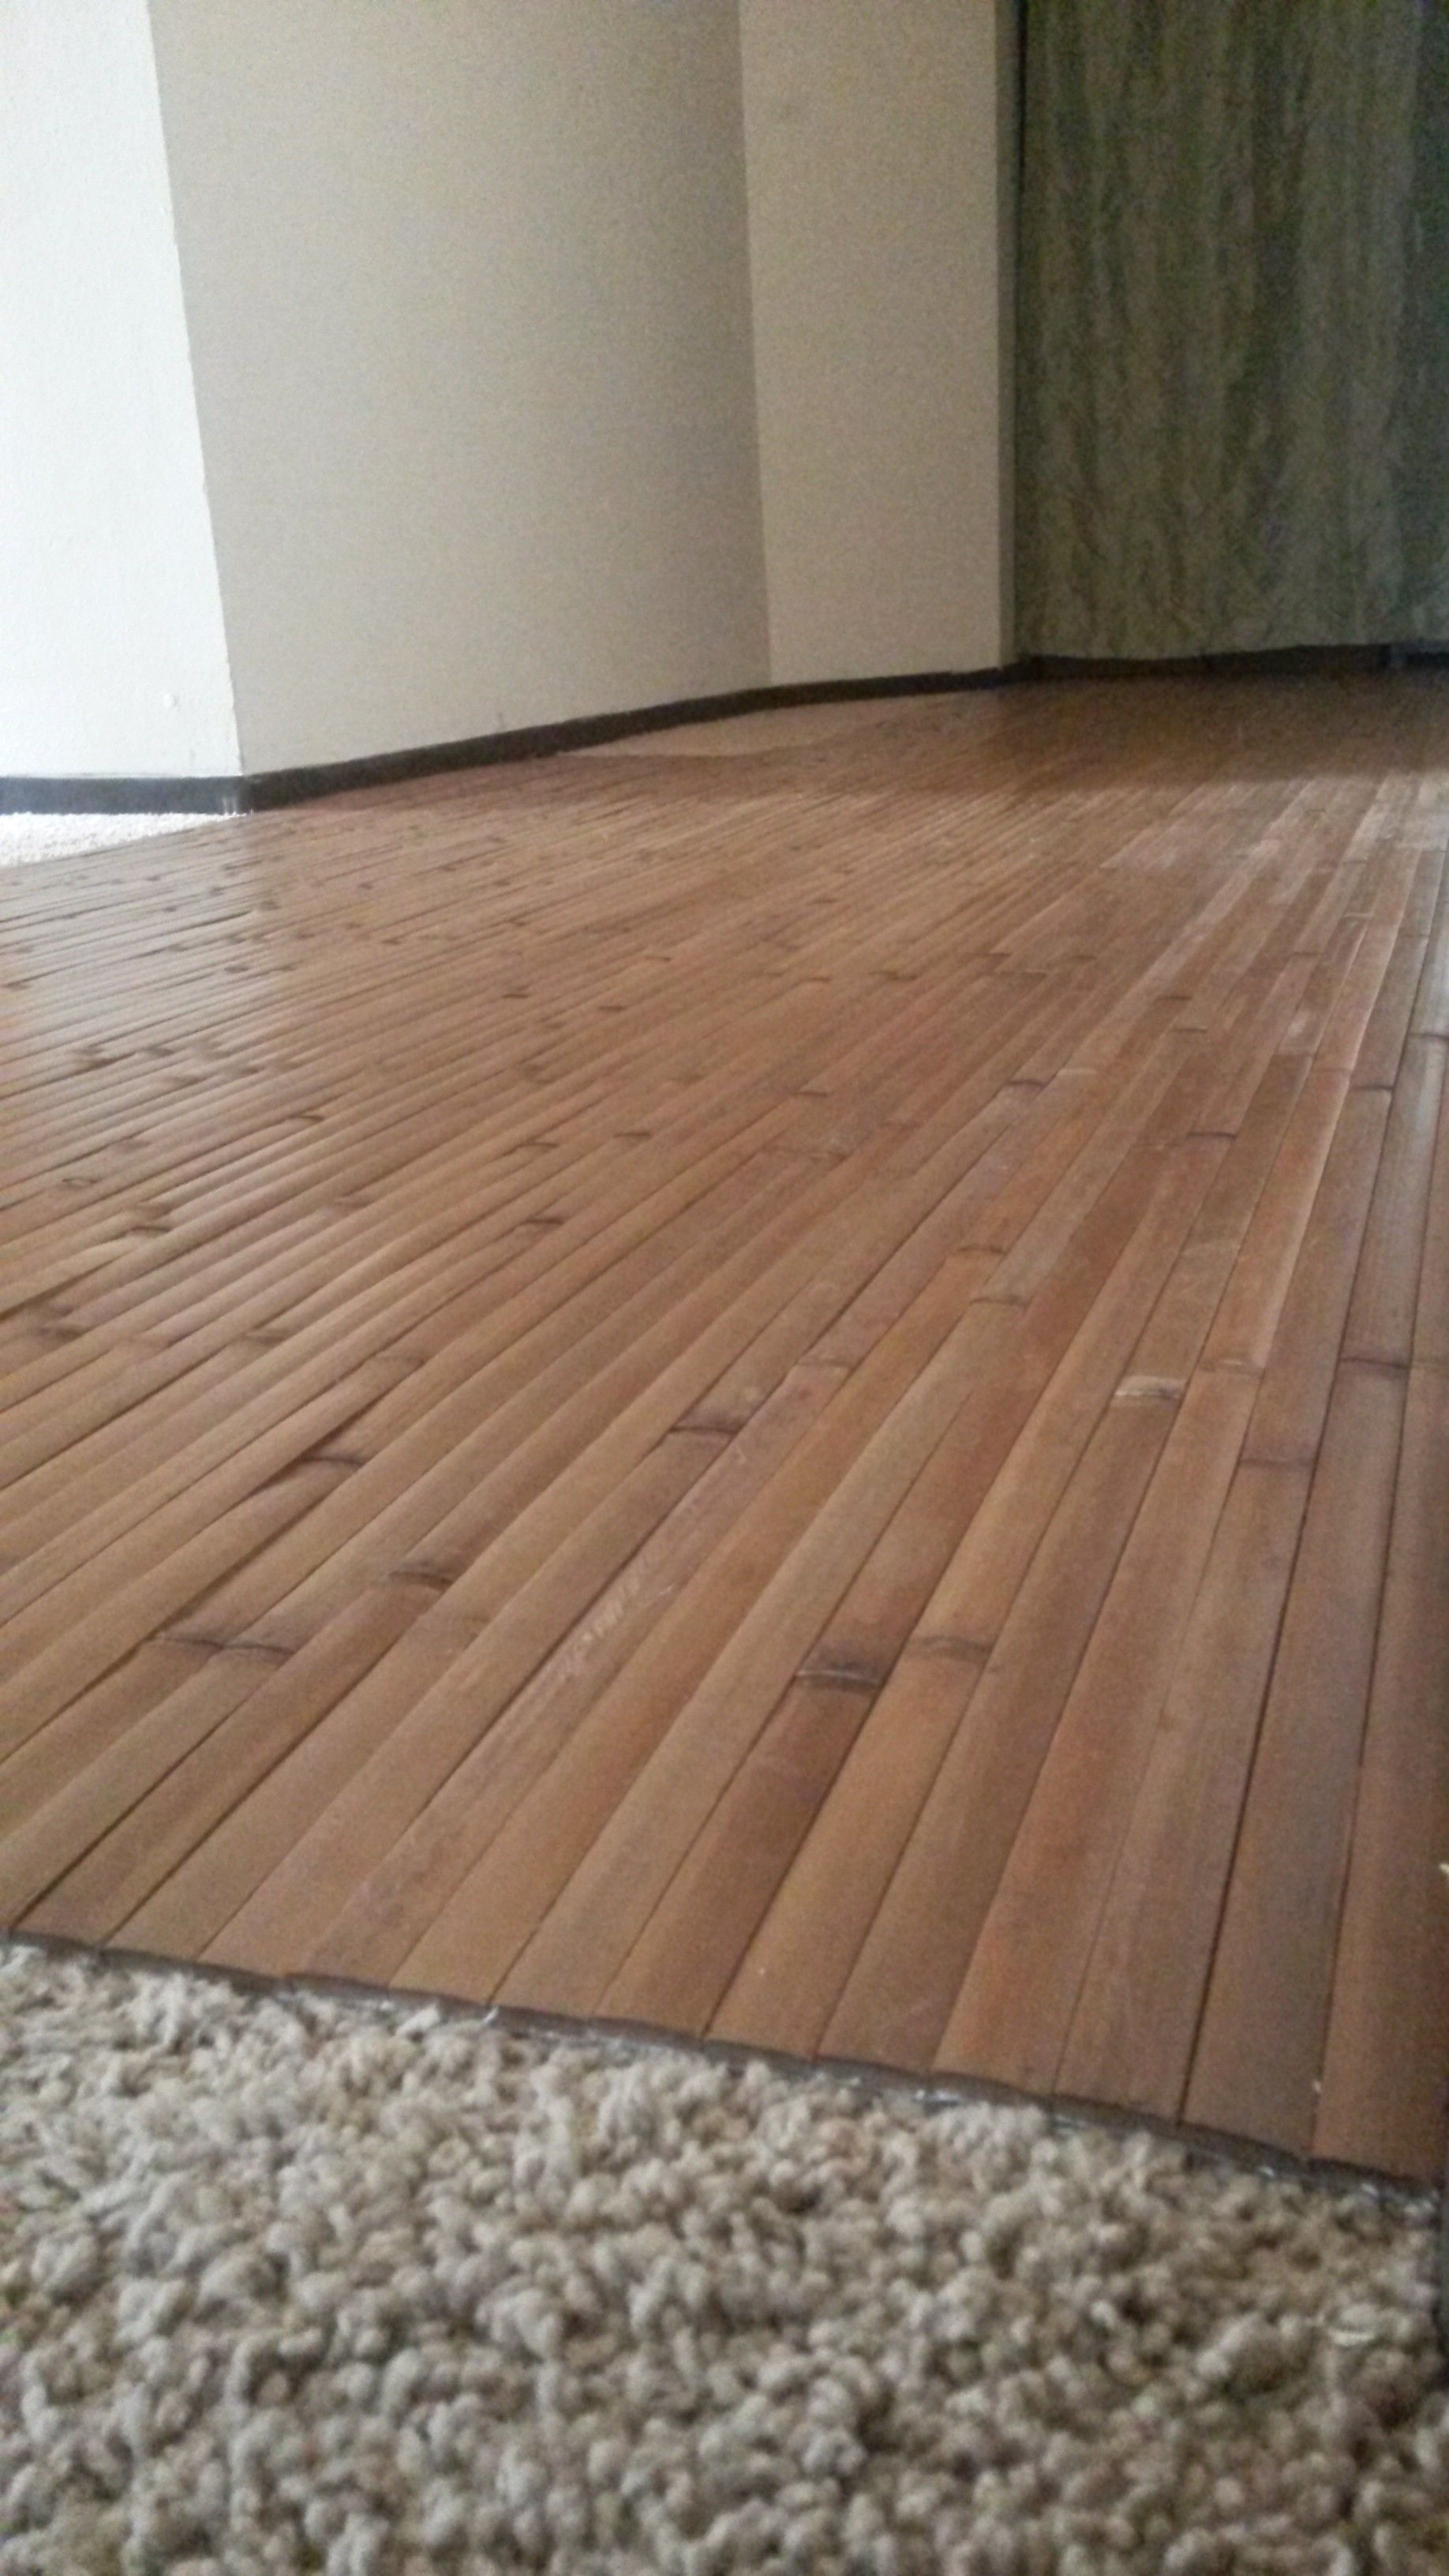 Putting Hardwood Floors Over Carpet Laying Wood Floors Laminate Hardwood Flooring Temporary Flooring